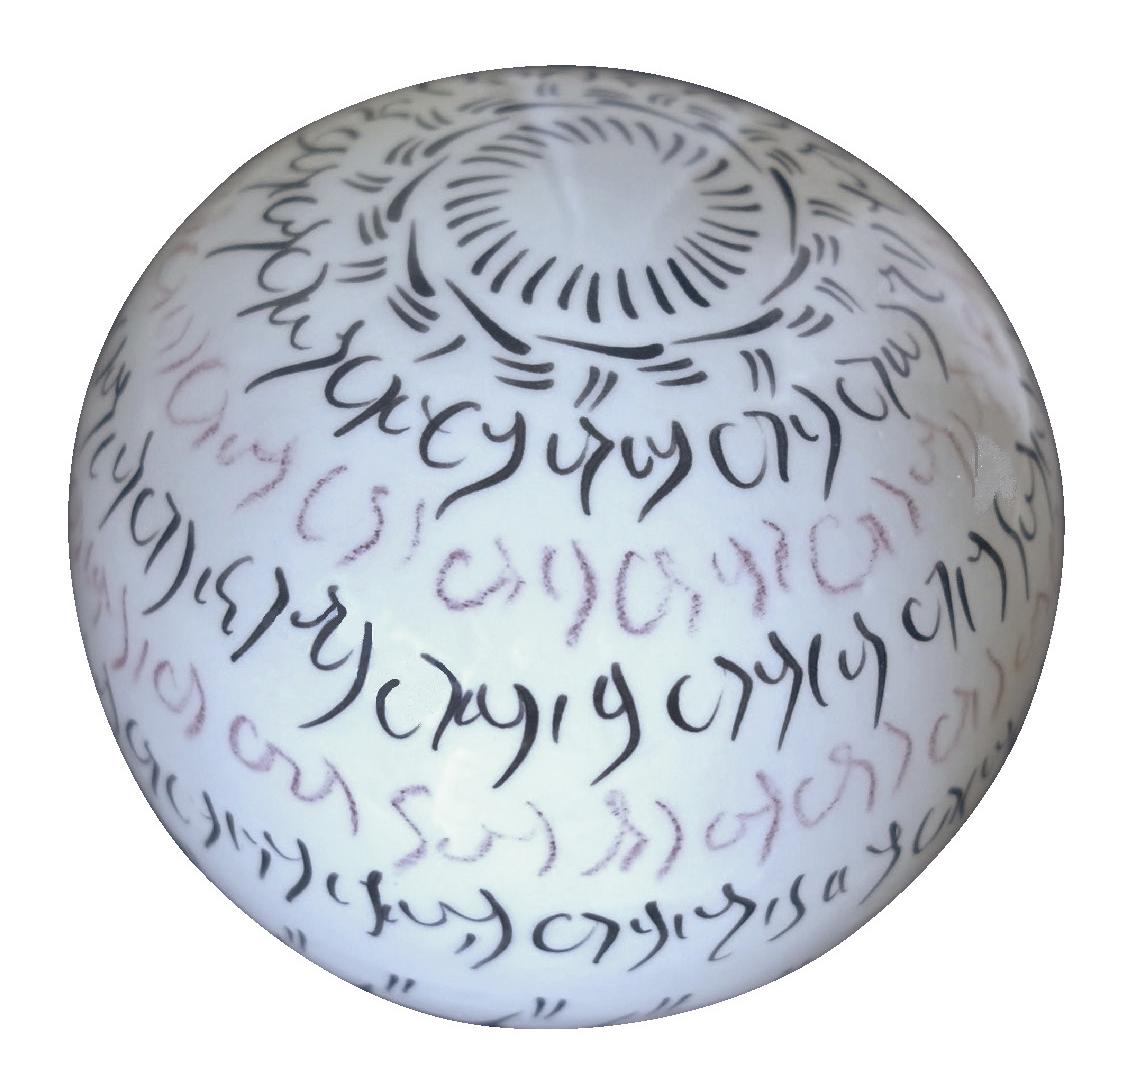 Lot 18 - Eli Gerard (1953) Poc 327 - H10 x D12 cm Ceramic, earthenware -